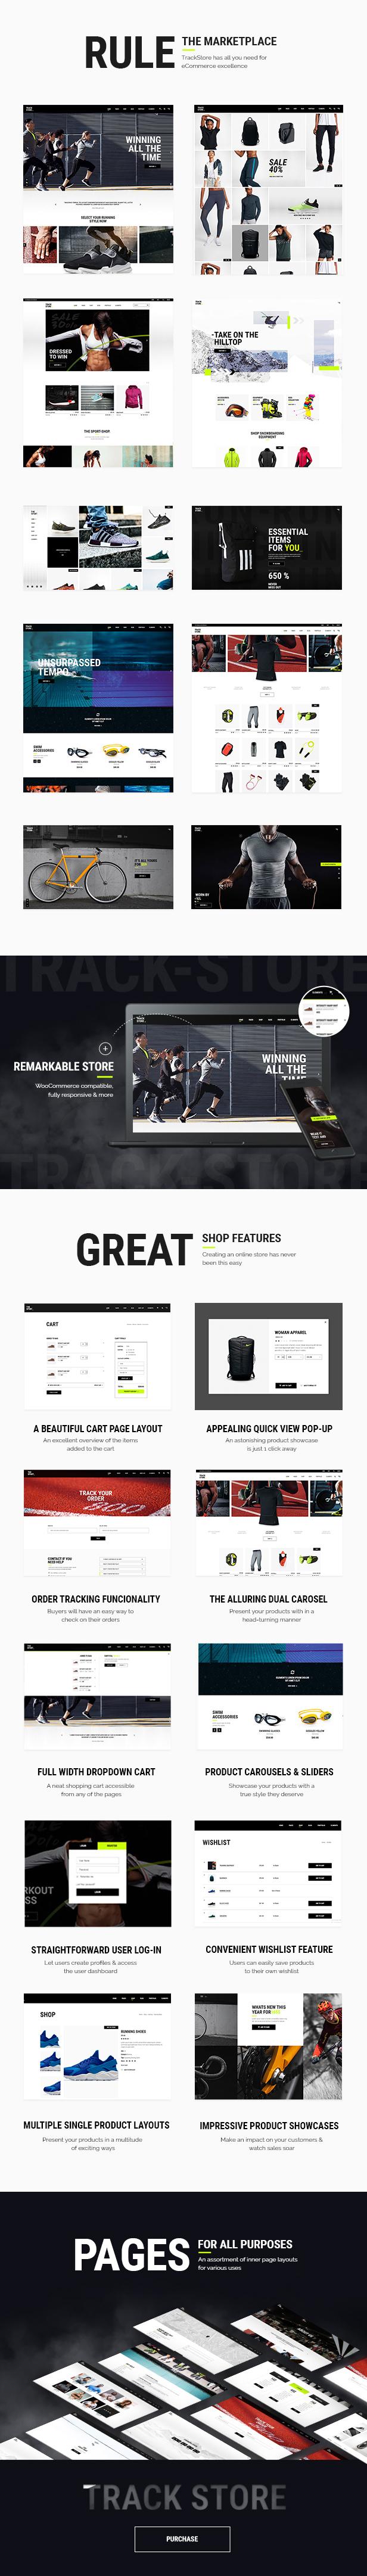 TrackStore - An Urban Sportswear Shop